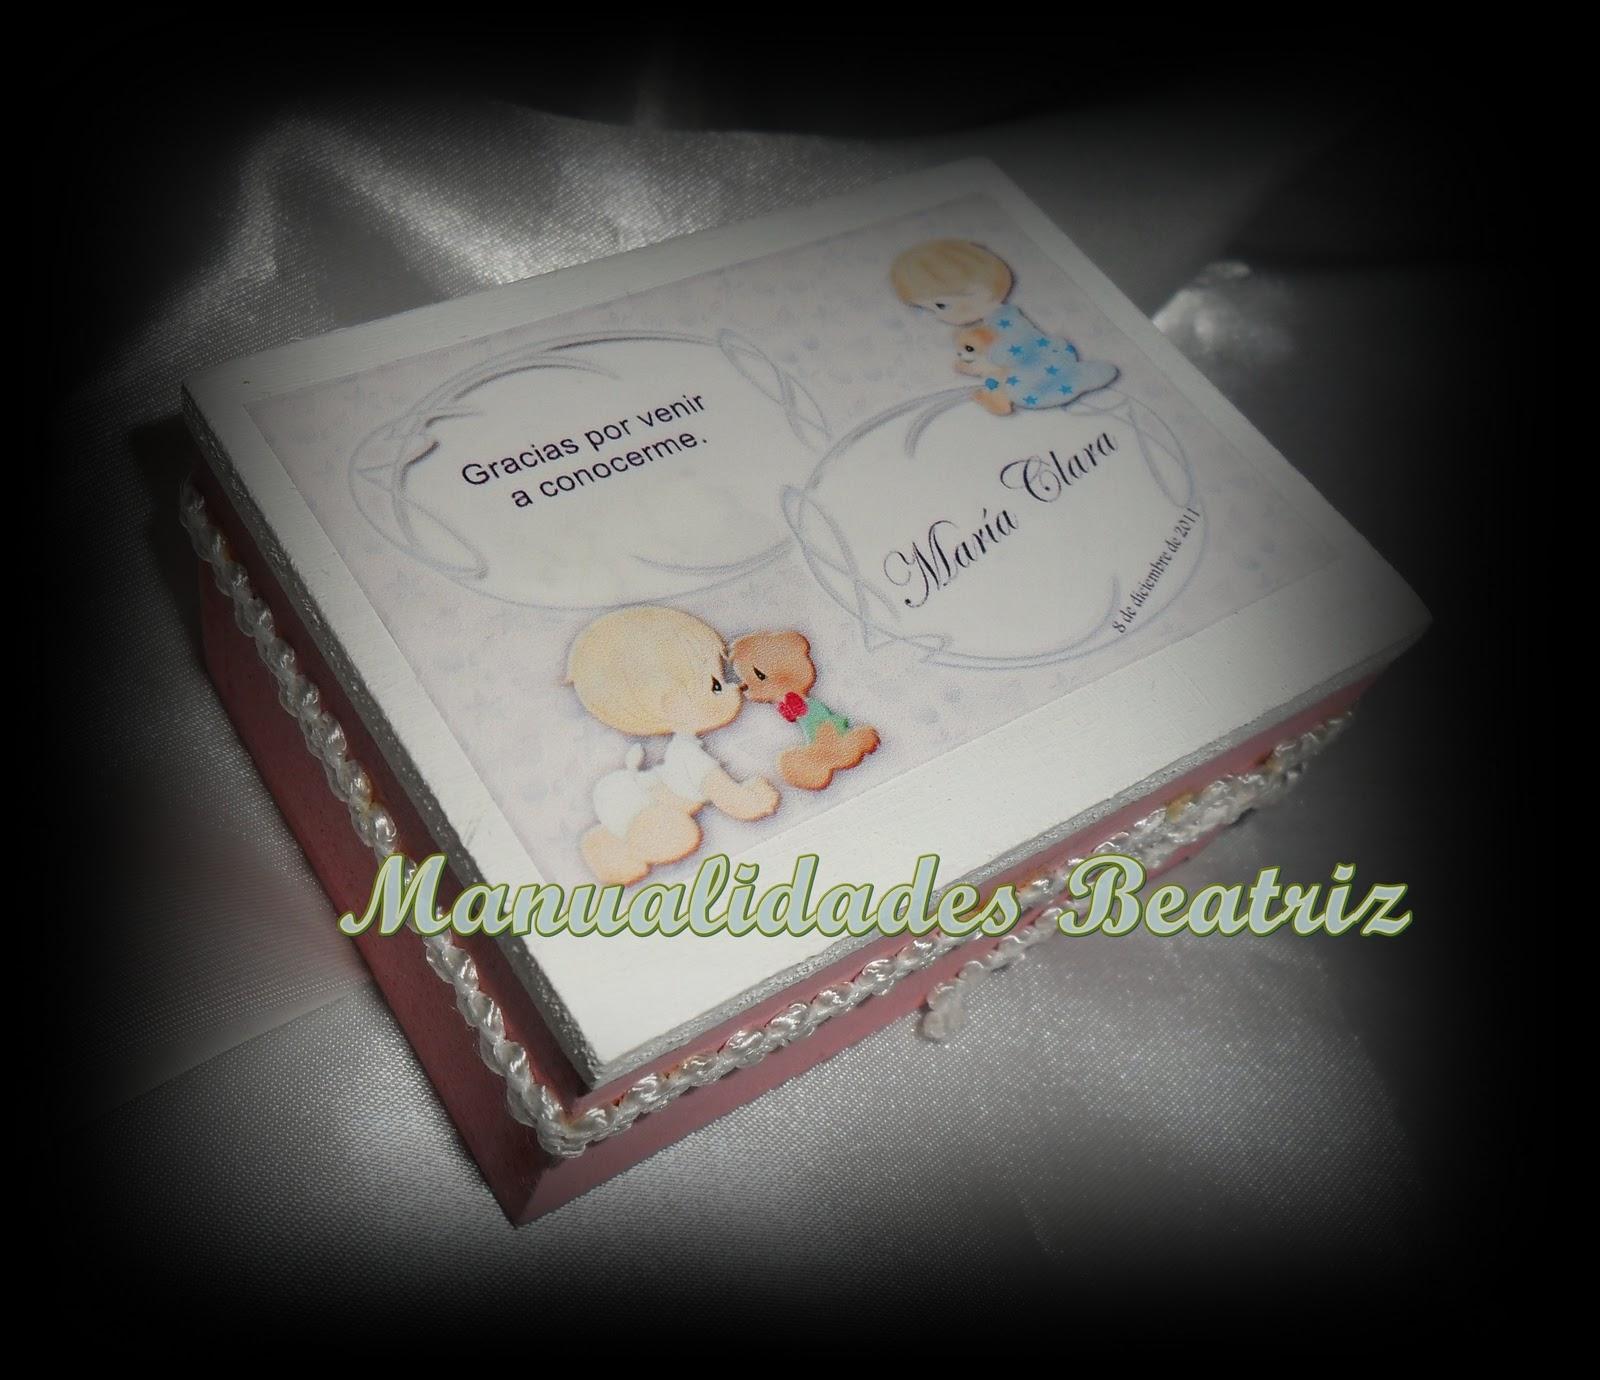 Manualidades Beatriz: Souvenir de Nacimiento